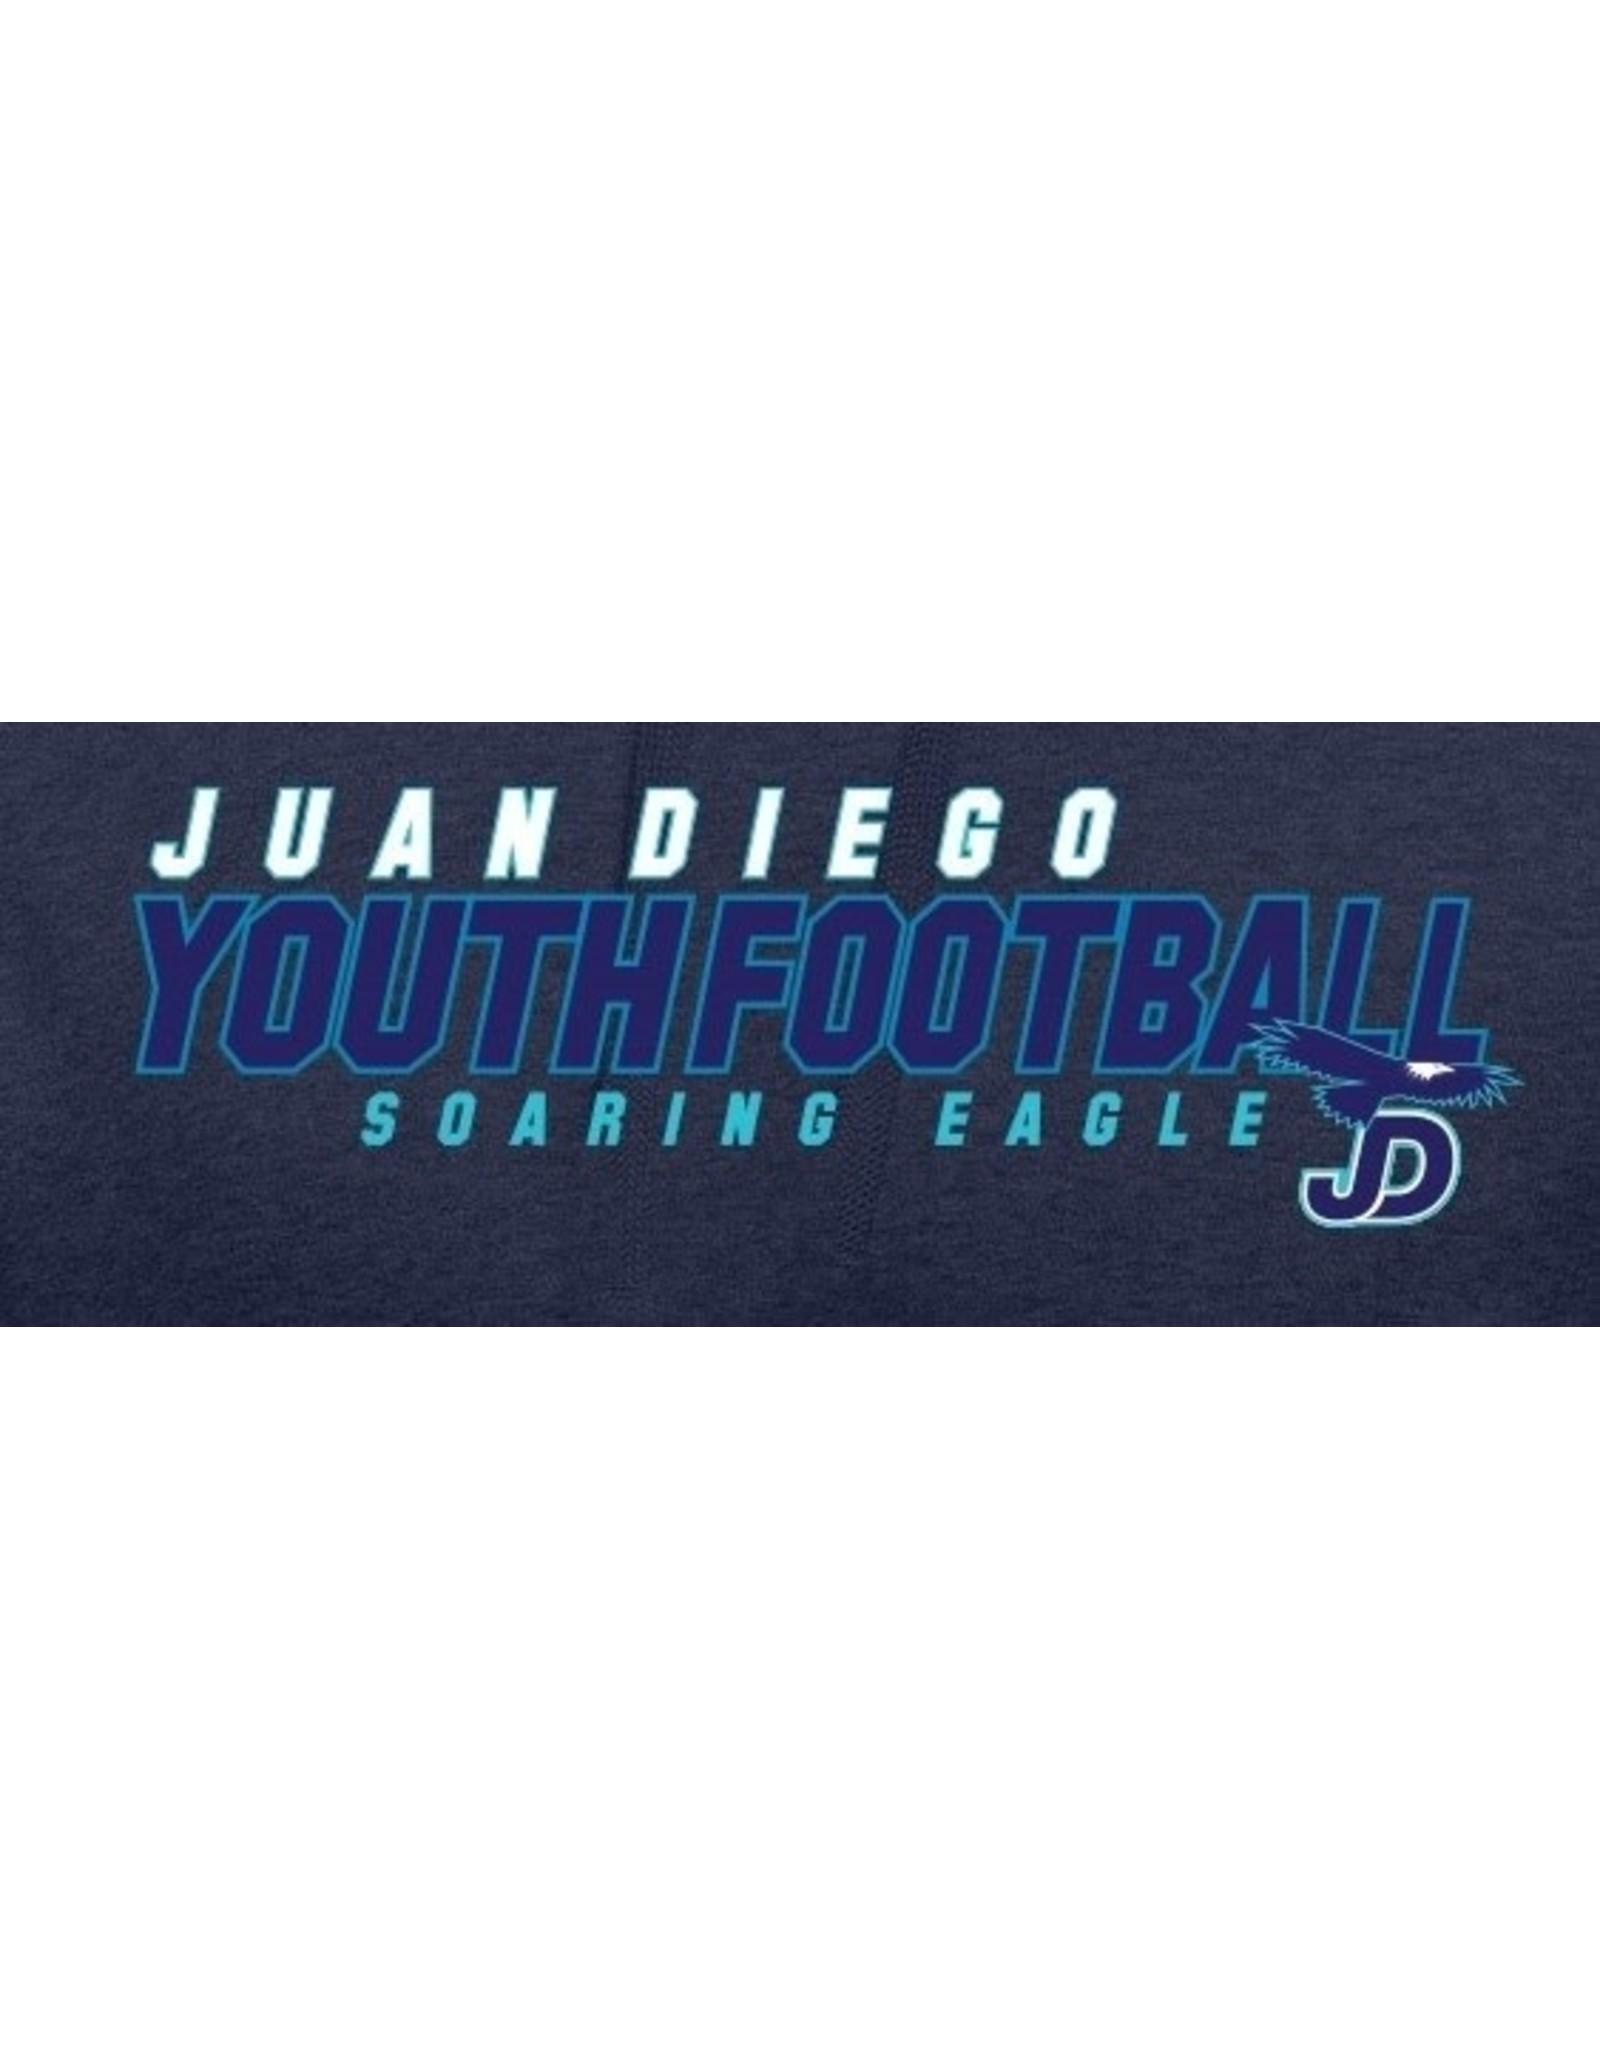 NON-UNIFORM Nike Legend S/S, JD - Custom, youth & adult sizes